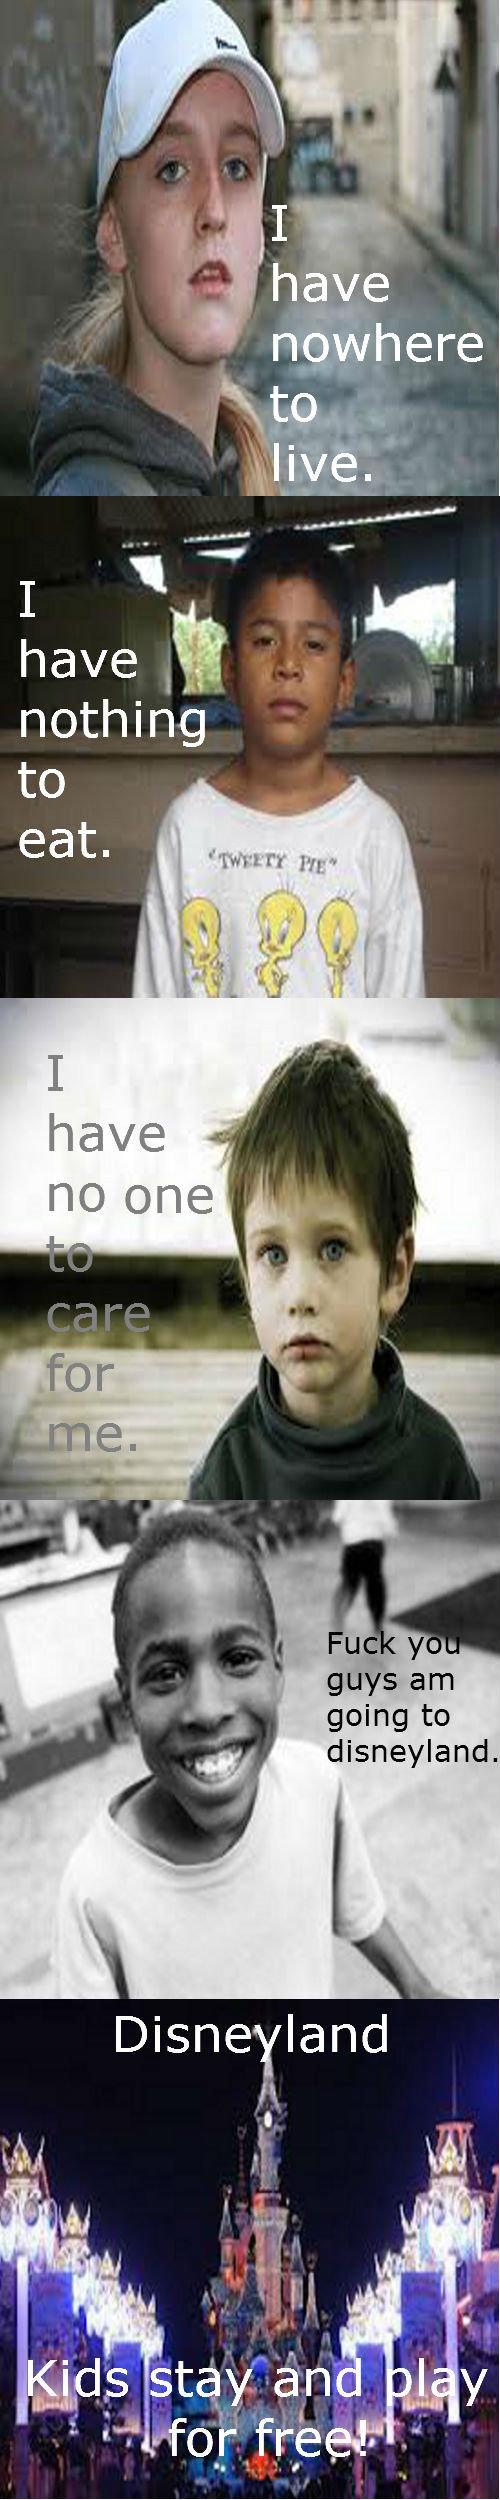 Smart homeless kid.. . going to